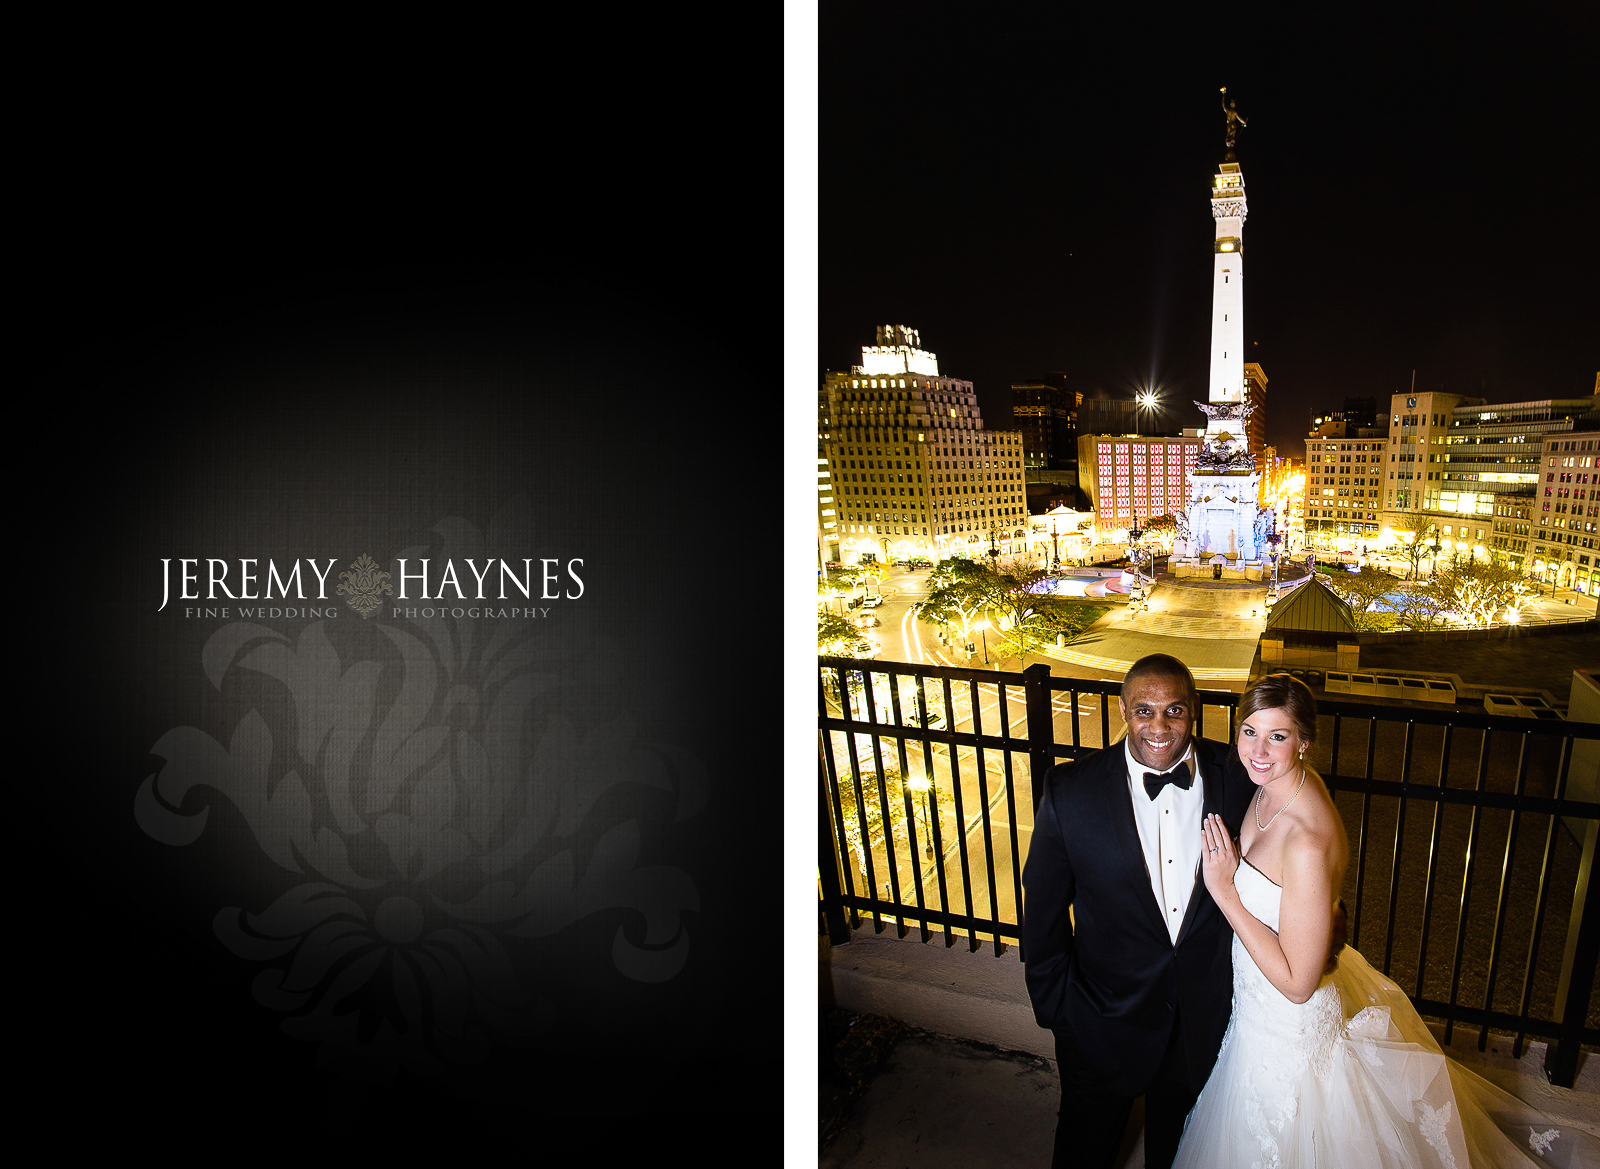 best-wedding-photos-sheraton-indianapolis-city-centre